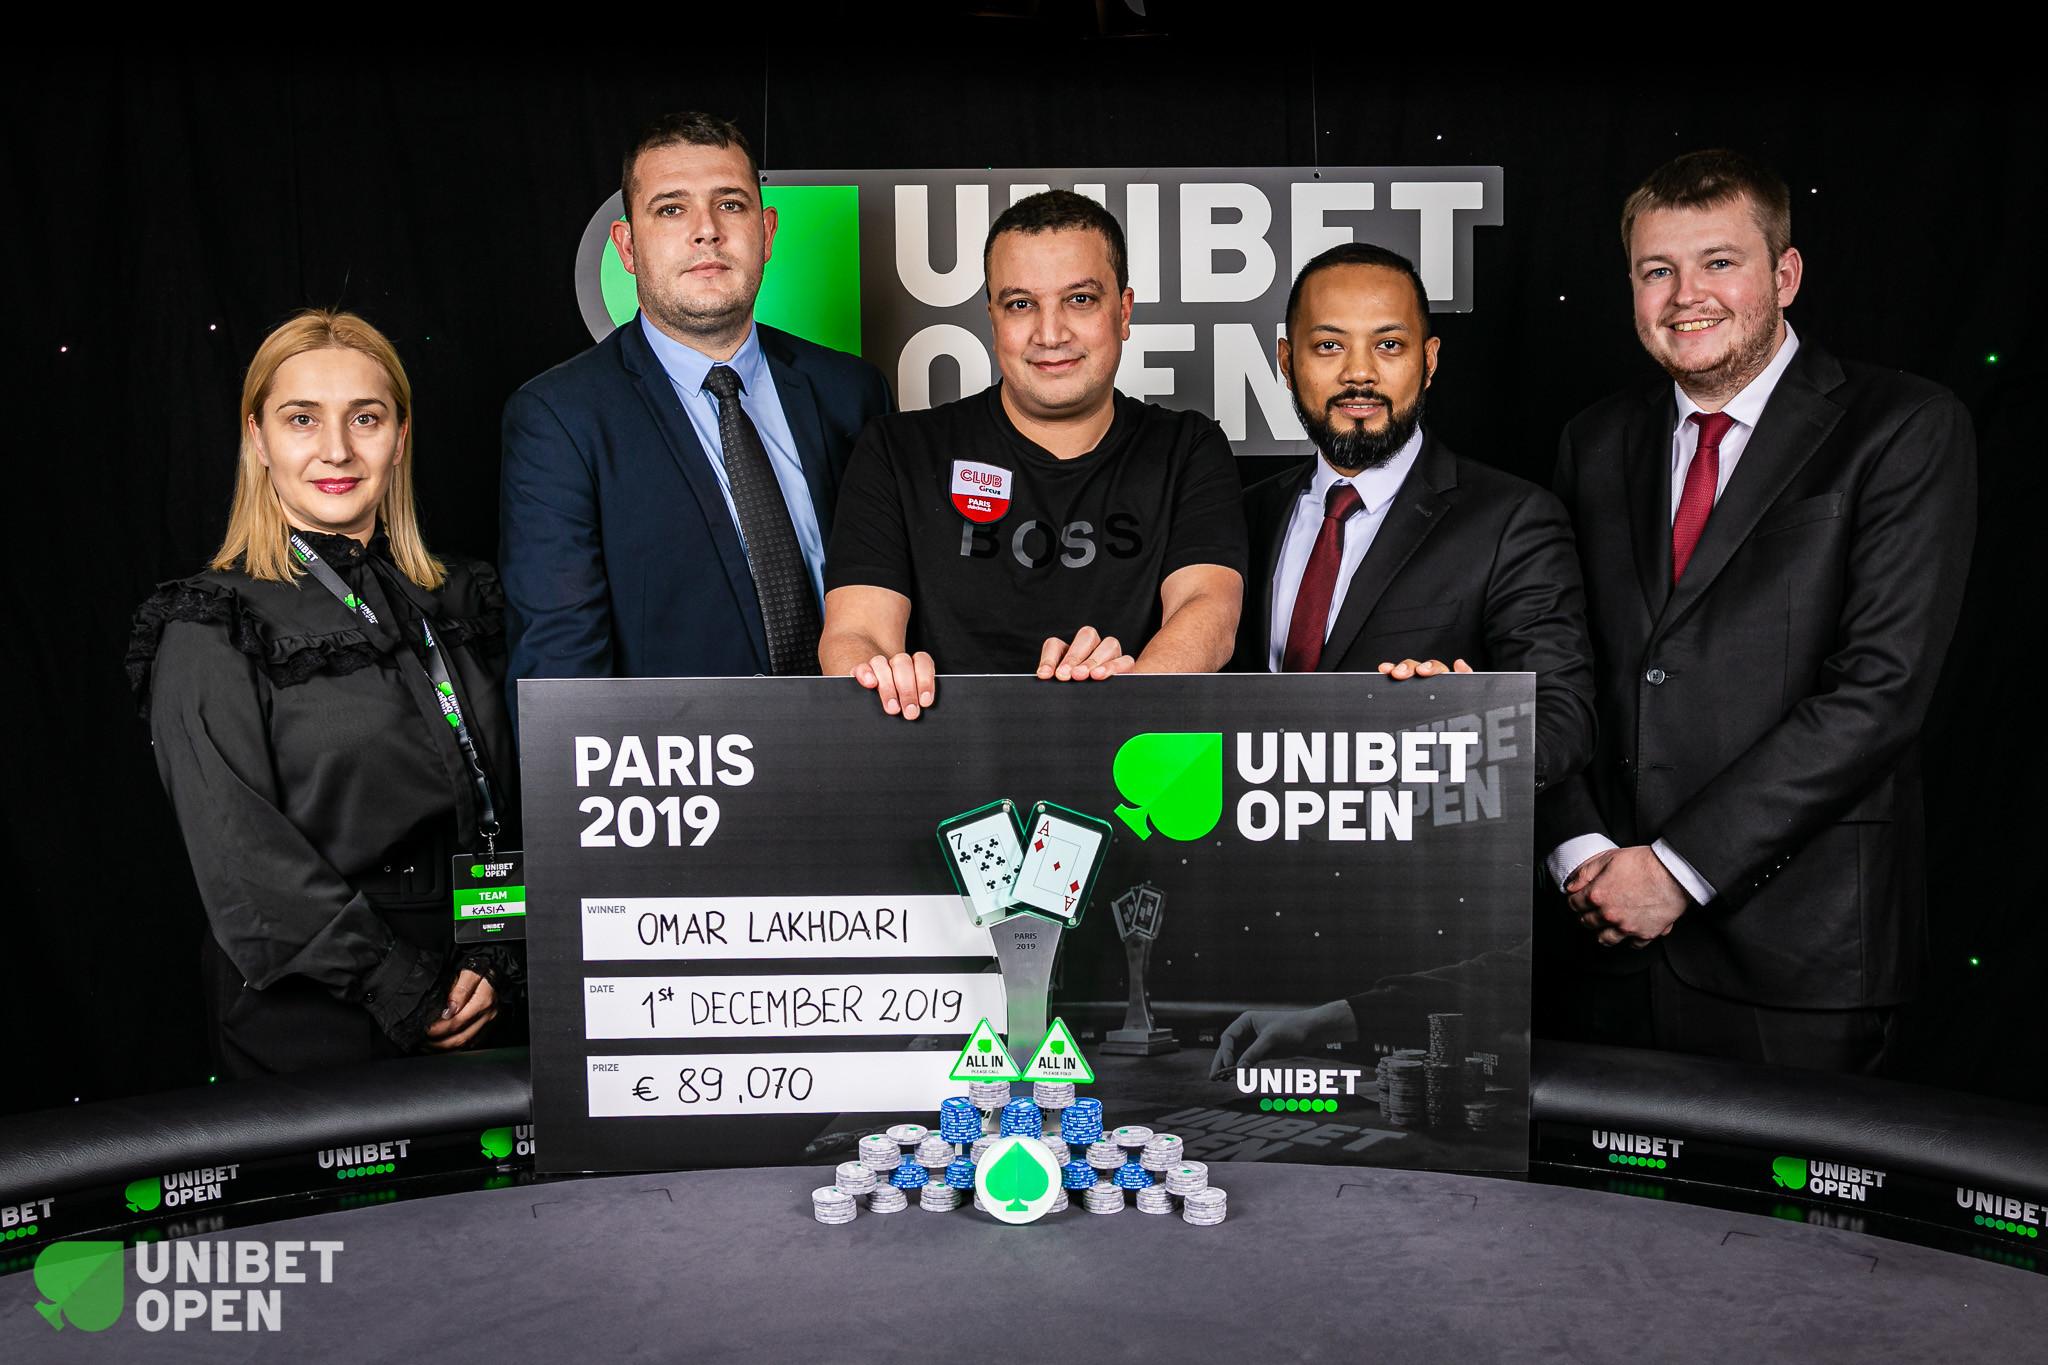 Omar Lakhdari wins Unibet Open Paris